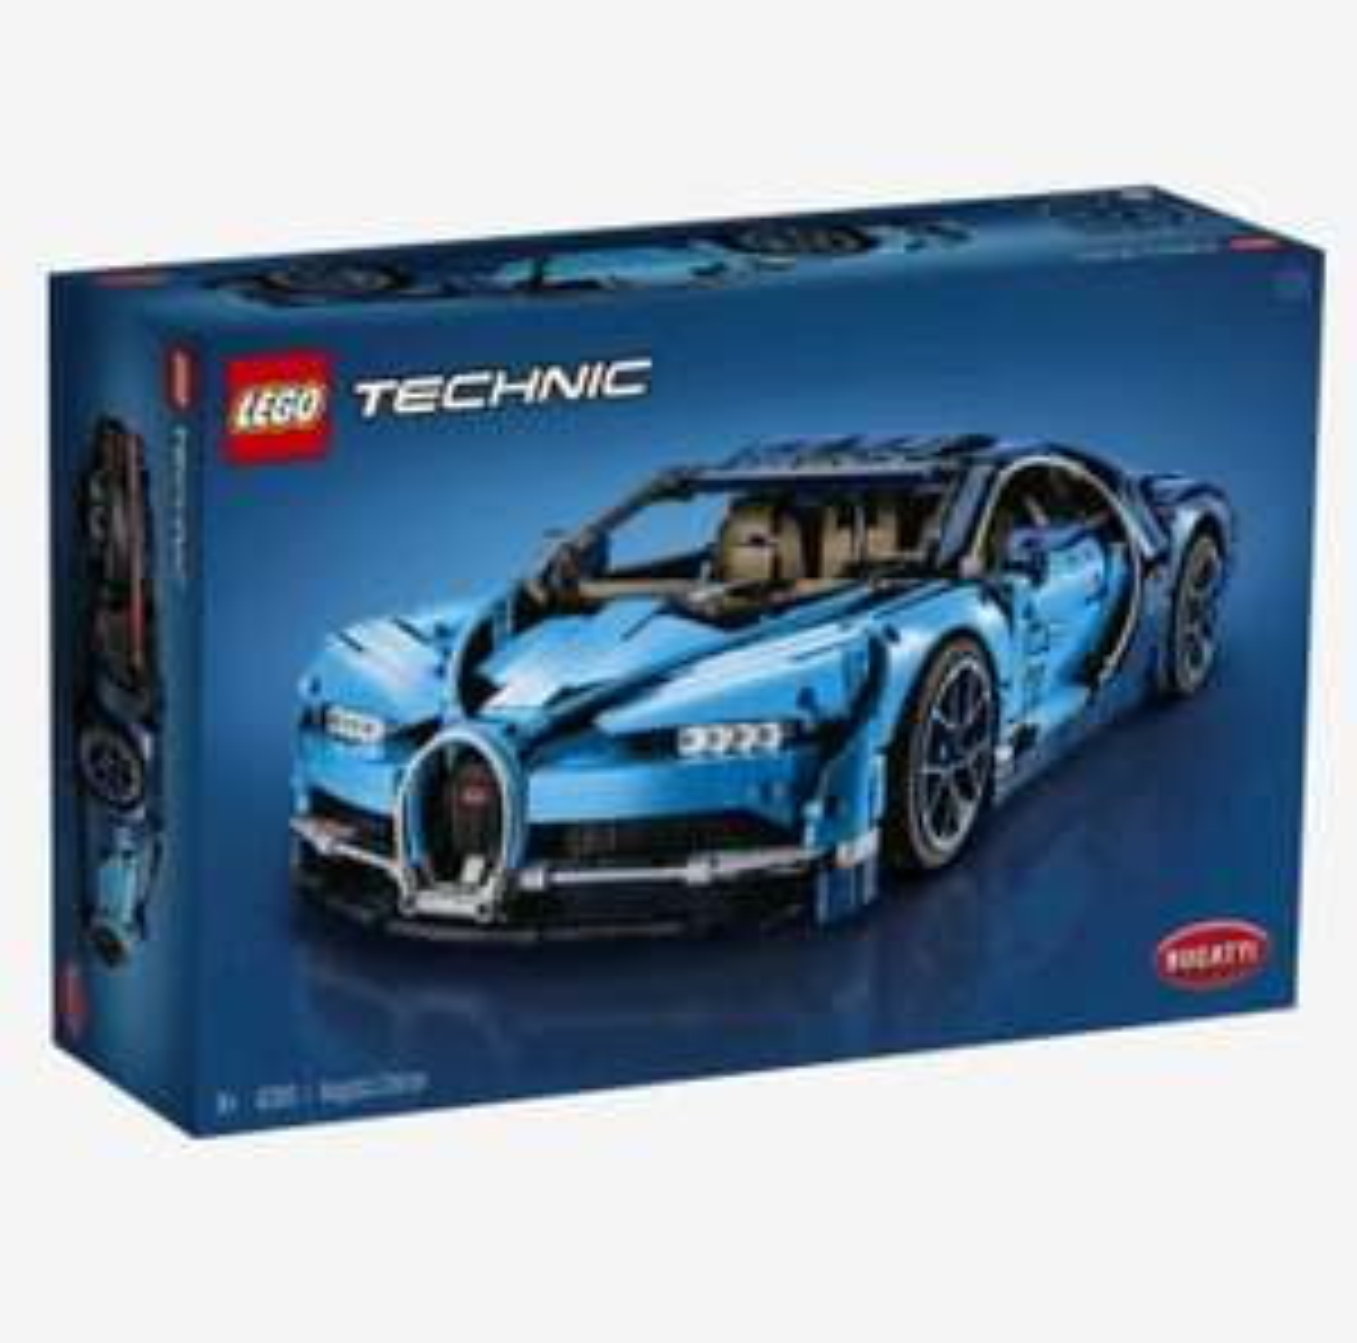 [Dagdeal] Lego Technic tot 35% korting o.a. Bugatti Chiron